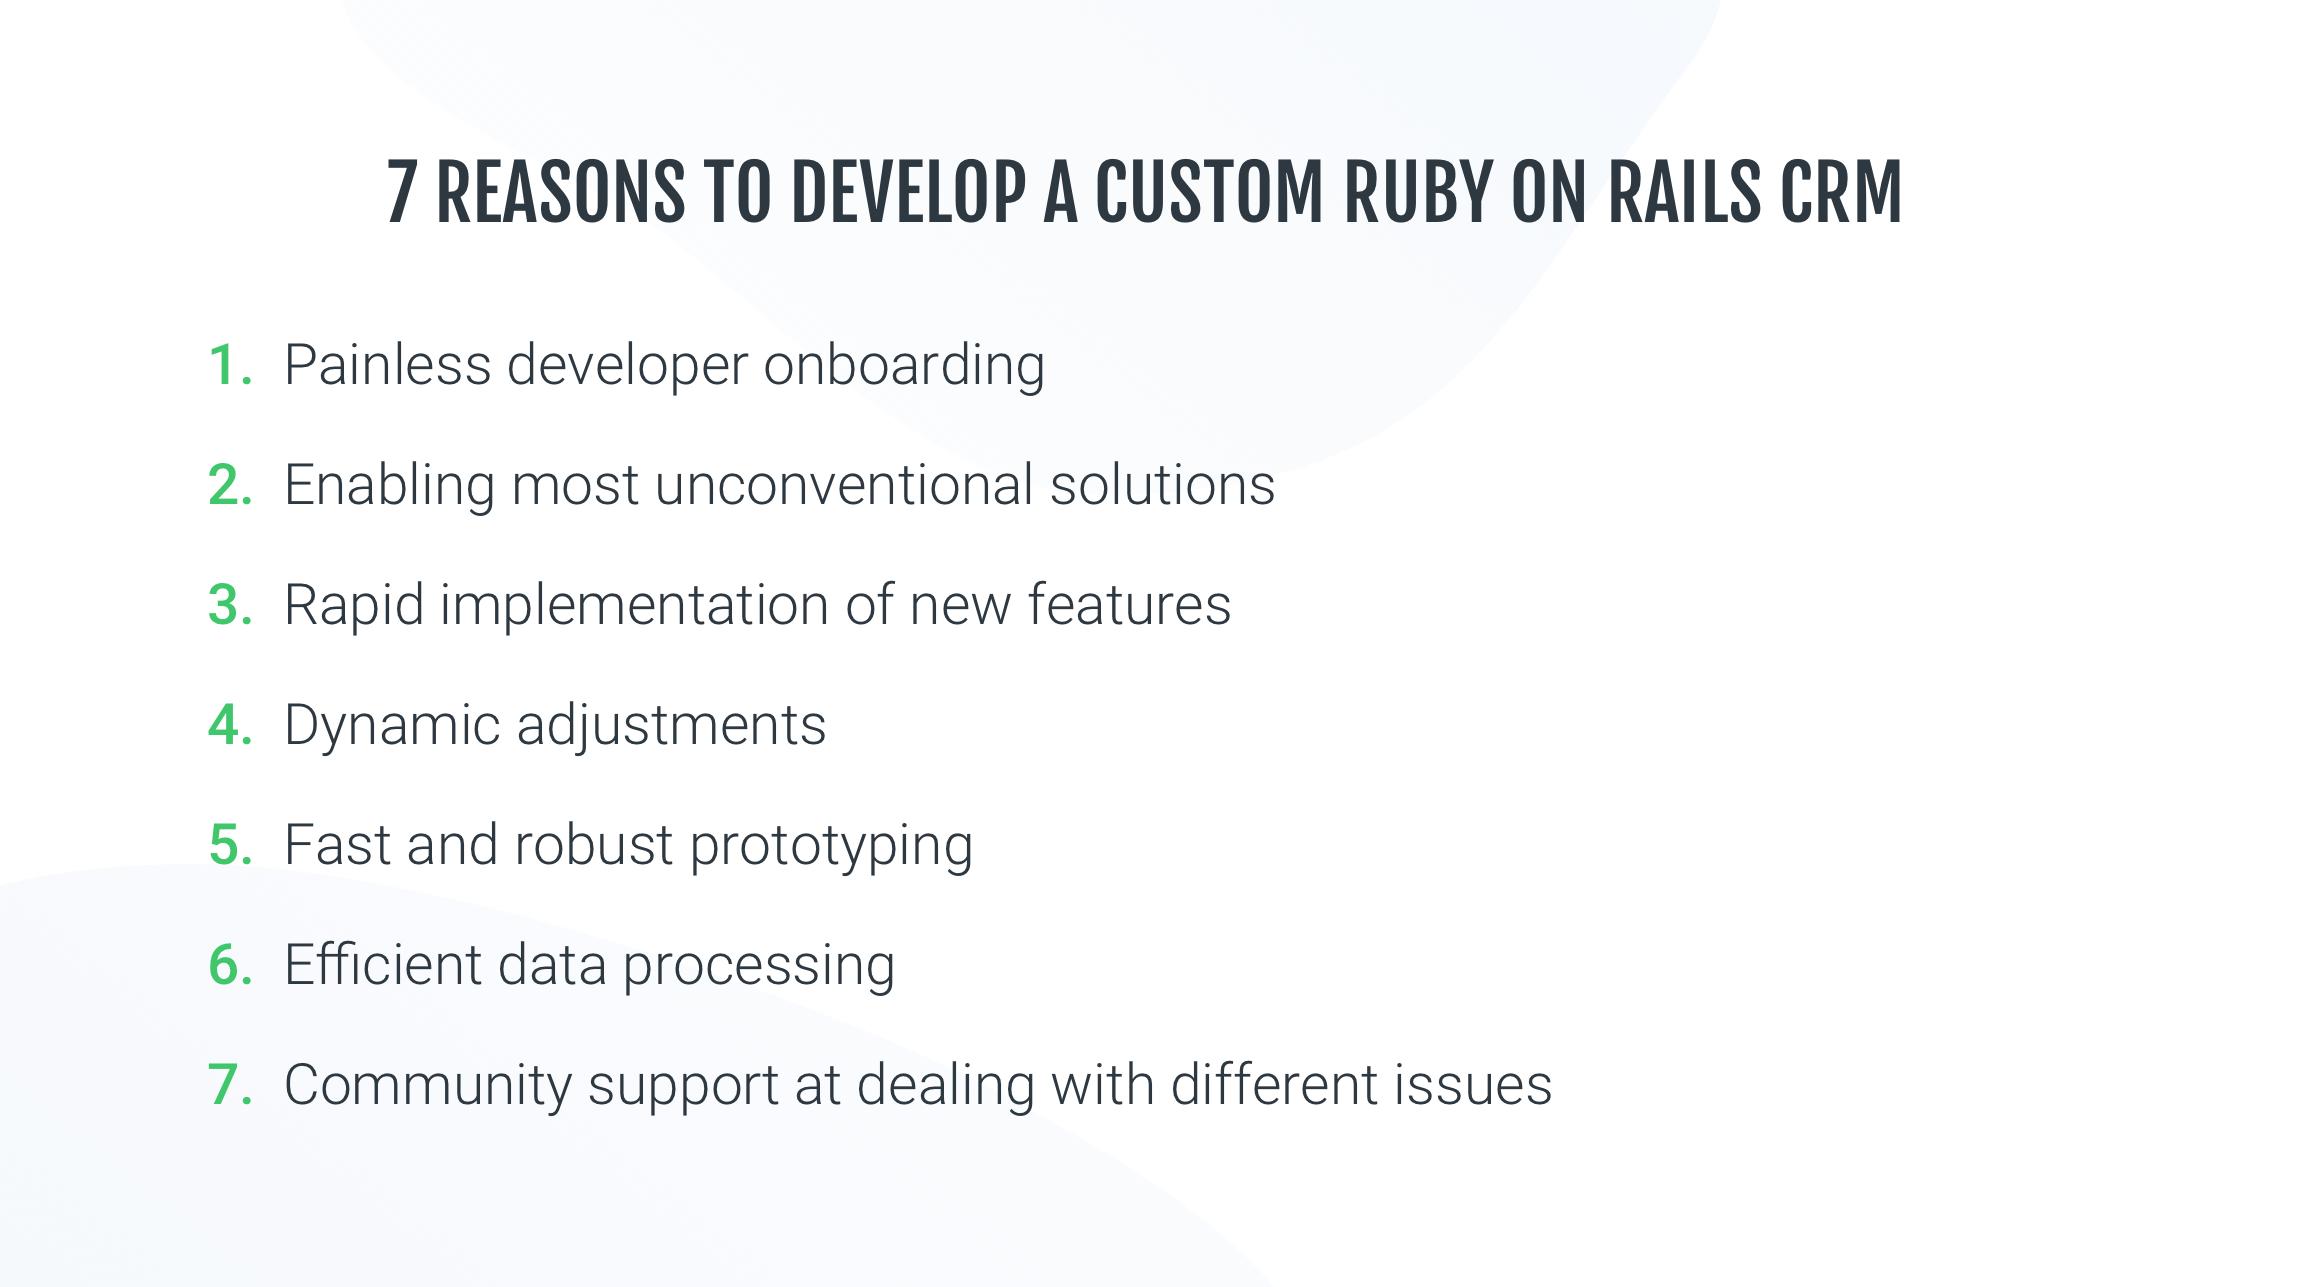 7-reasons-to-develop-custom-ruby-on-rails-crm